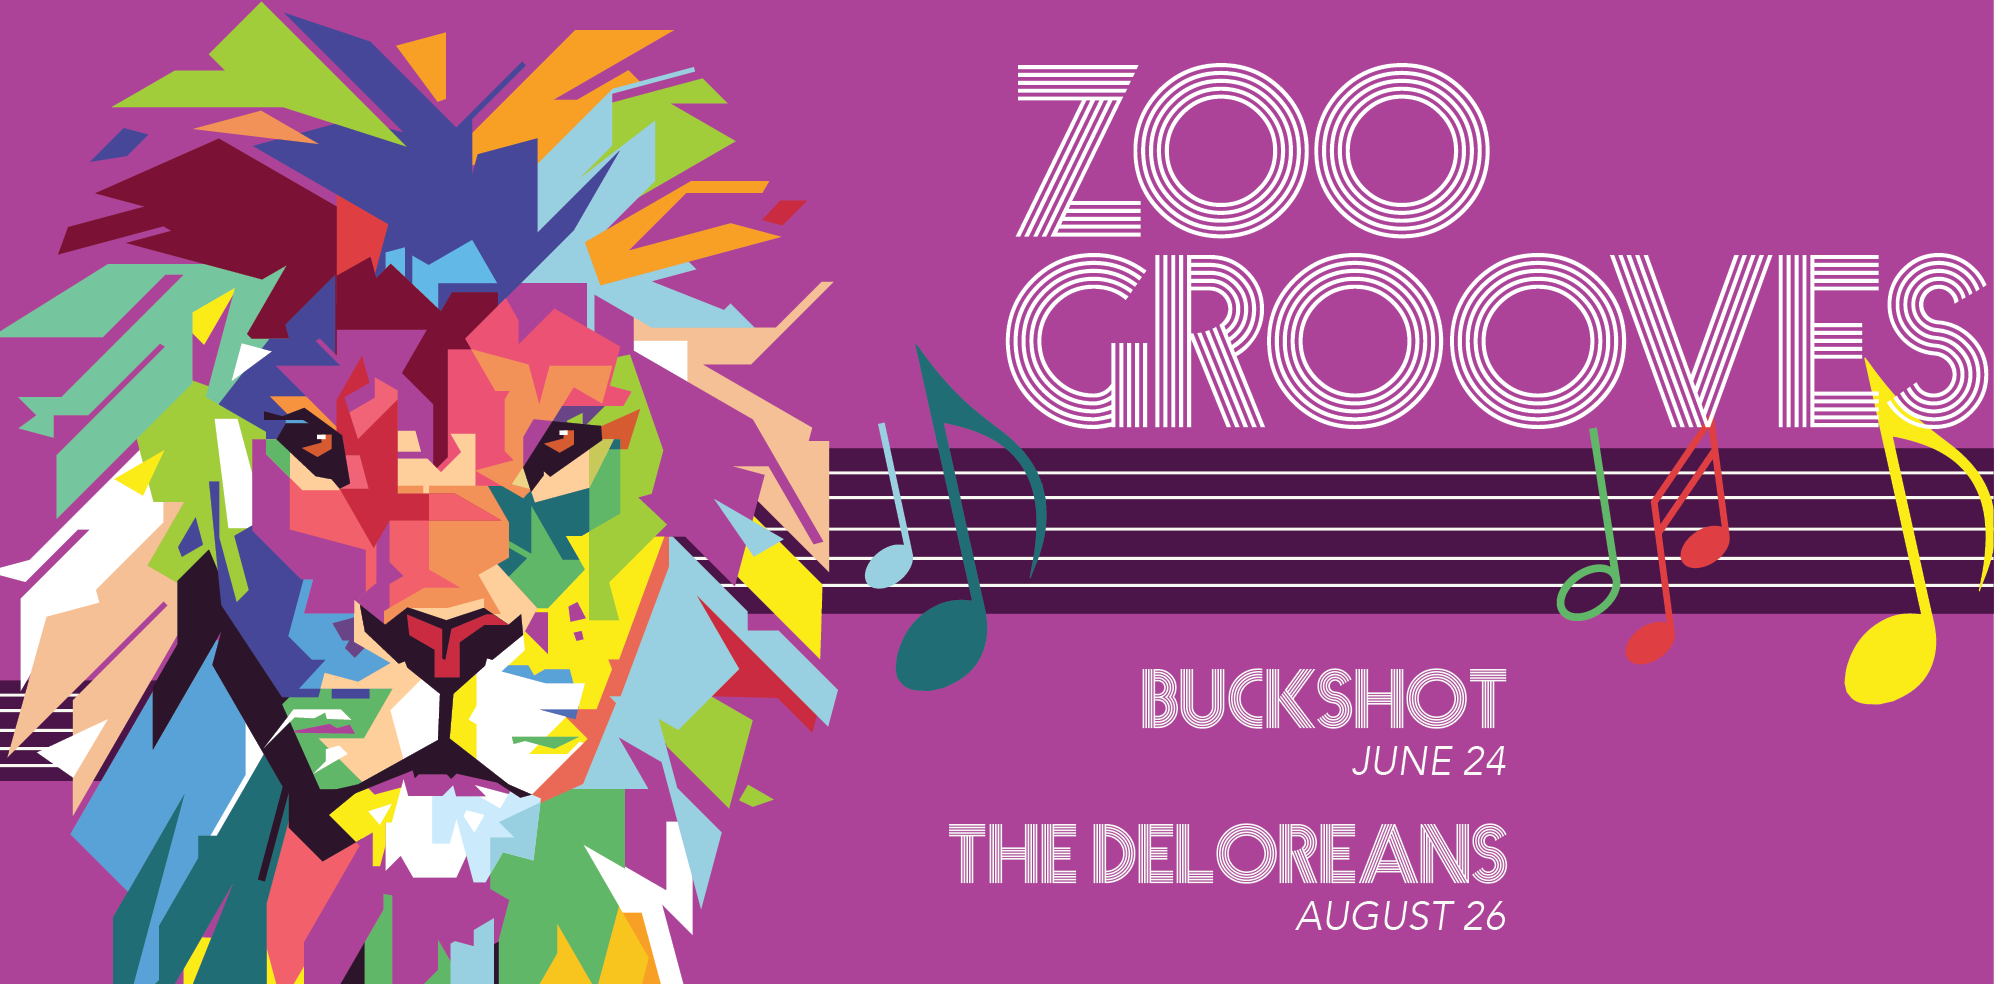 VAZOO_Zoo Grooves web banner